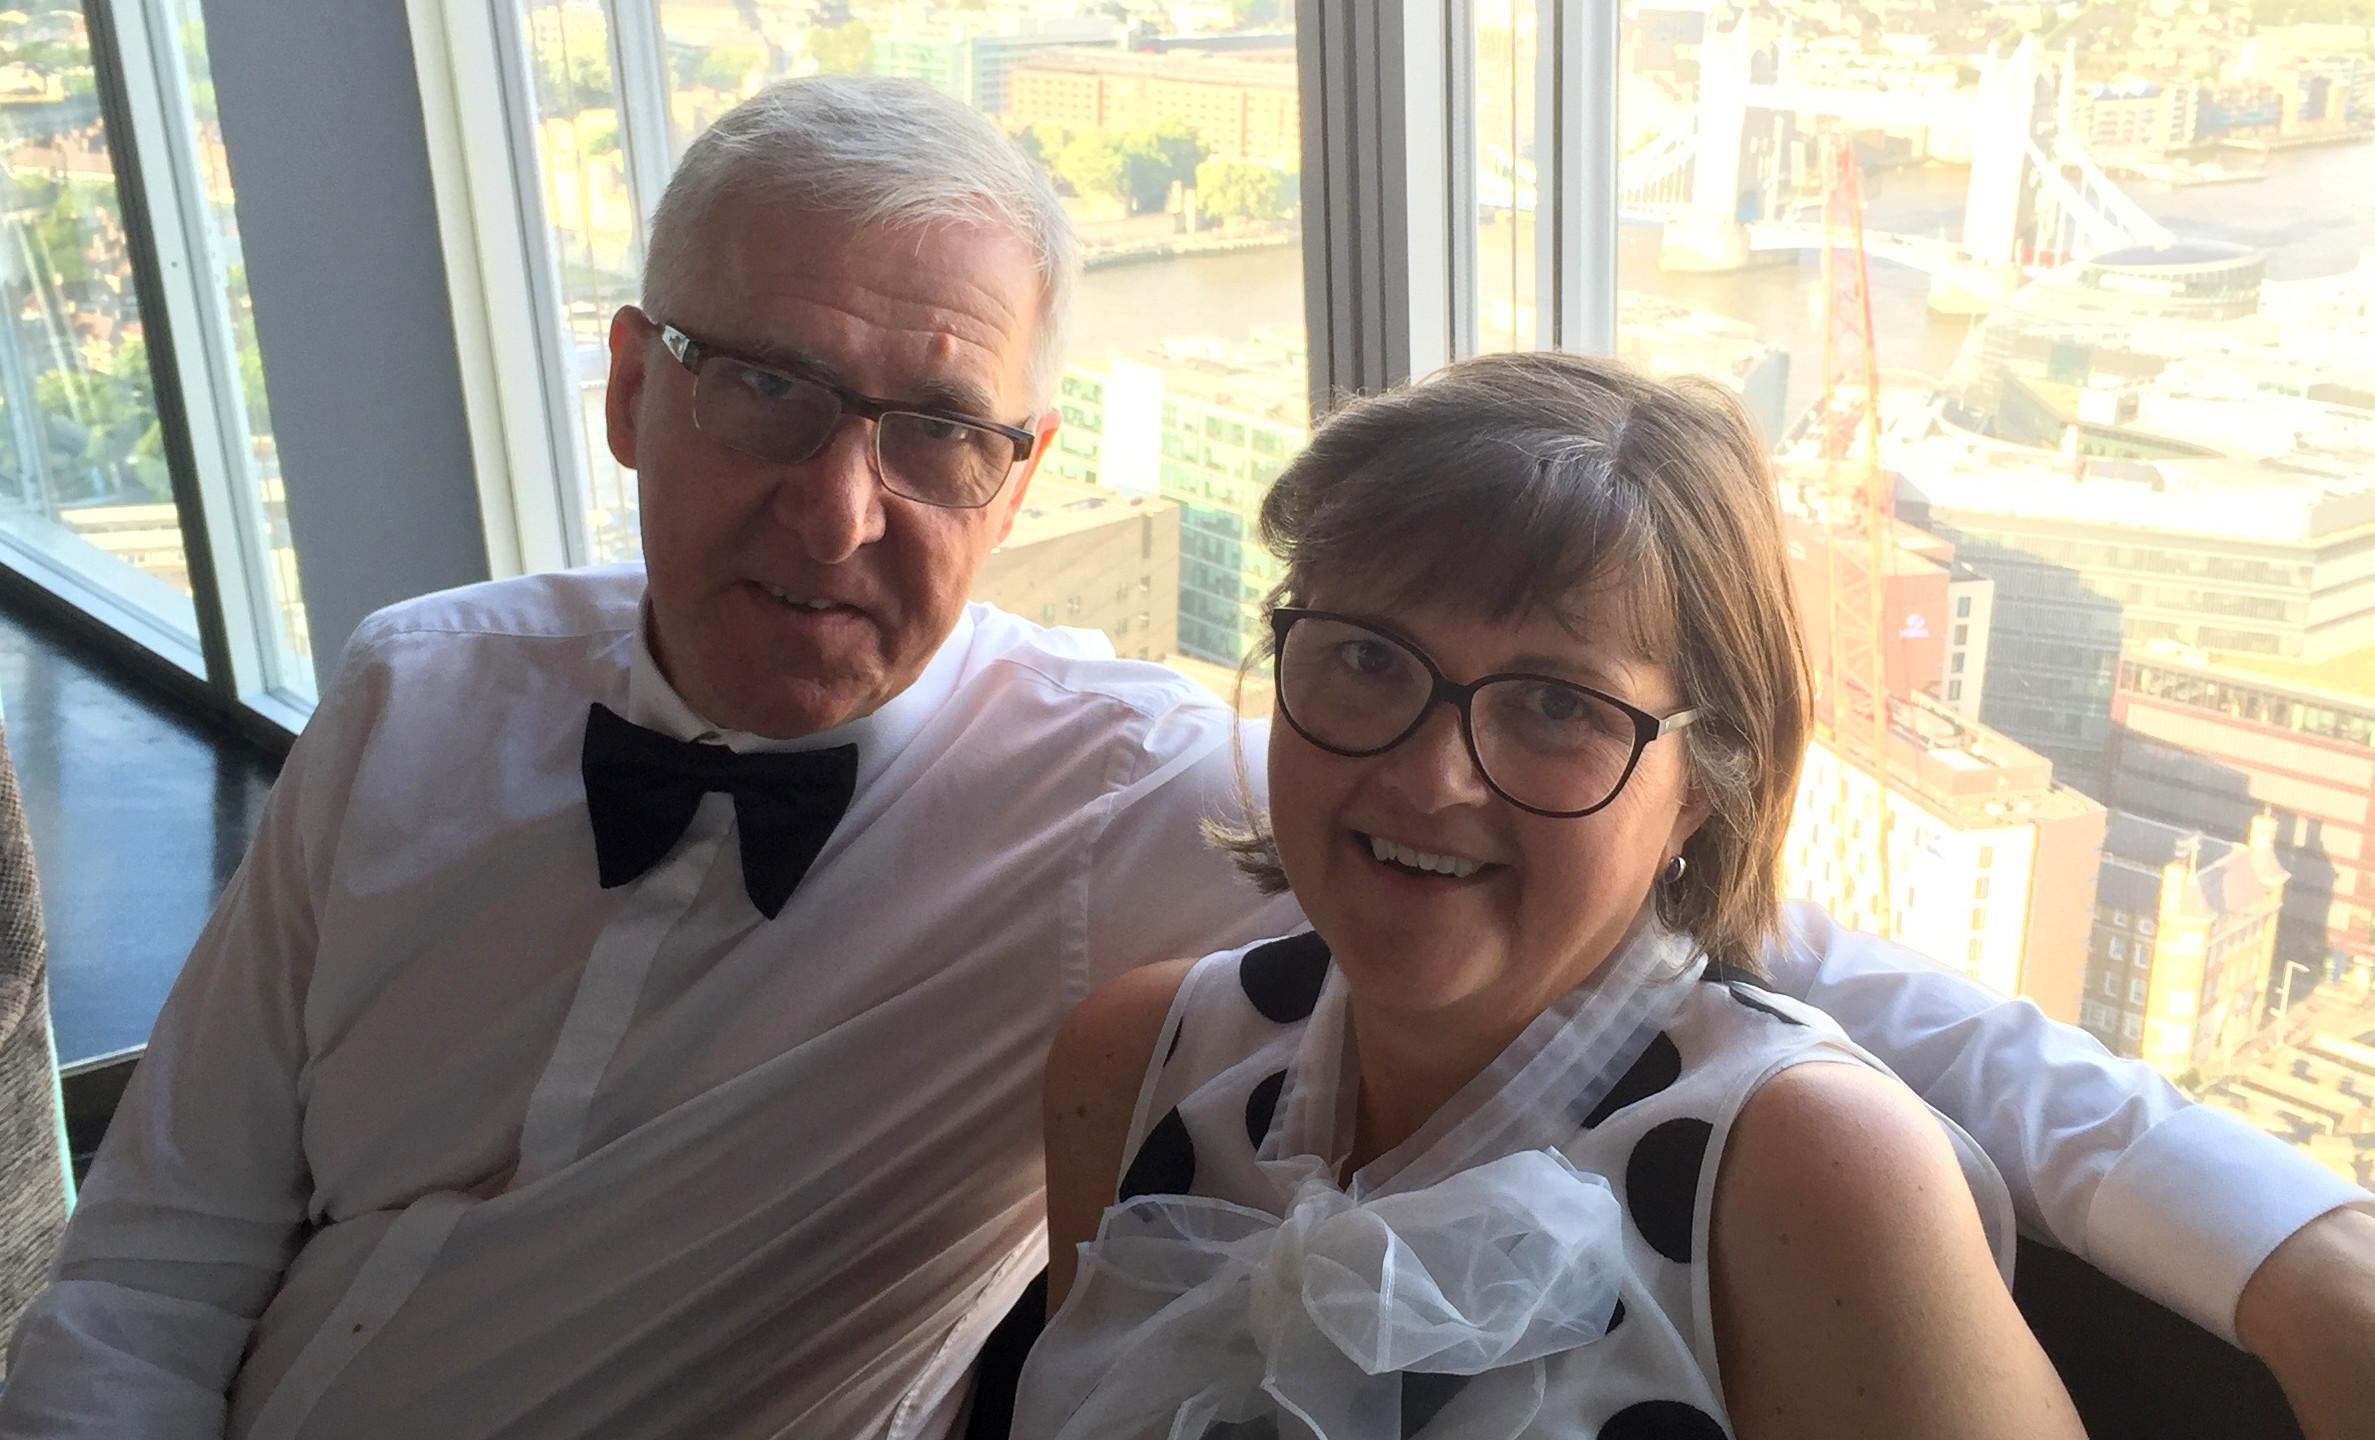 Company Director and Building Surveyor Tony joined by Netta Mackintosh Executive Secretary. Both looking glamorous.